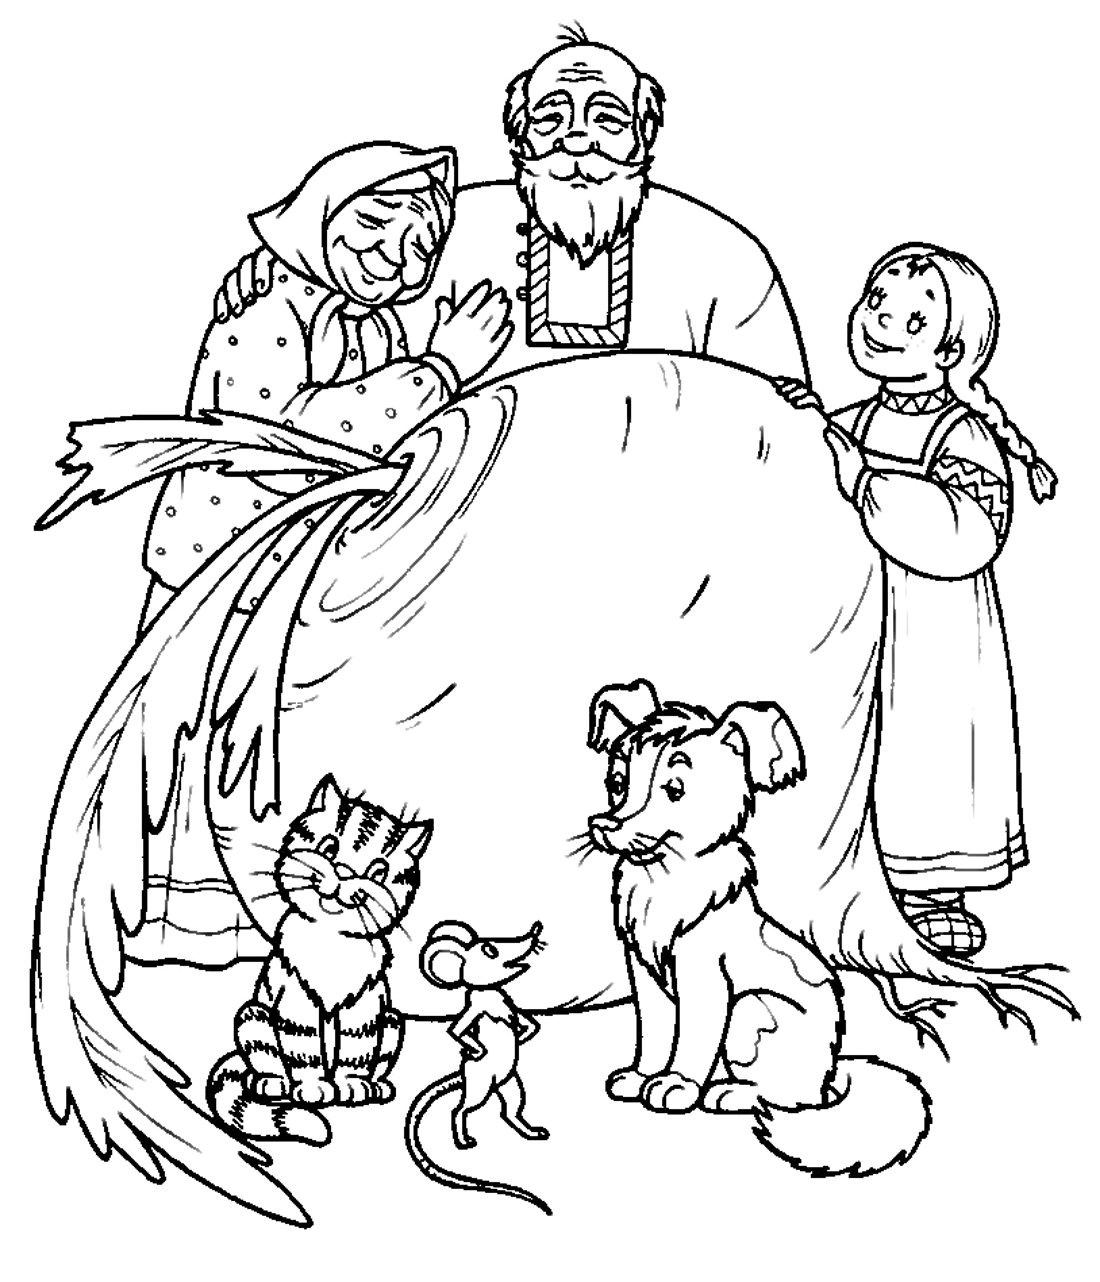 свободное рисунки к сказке репка карандашом назначении объекта сети